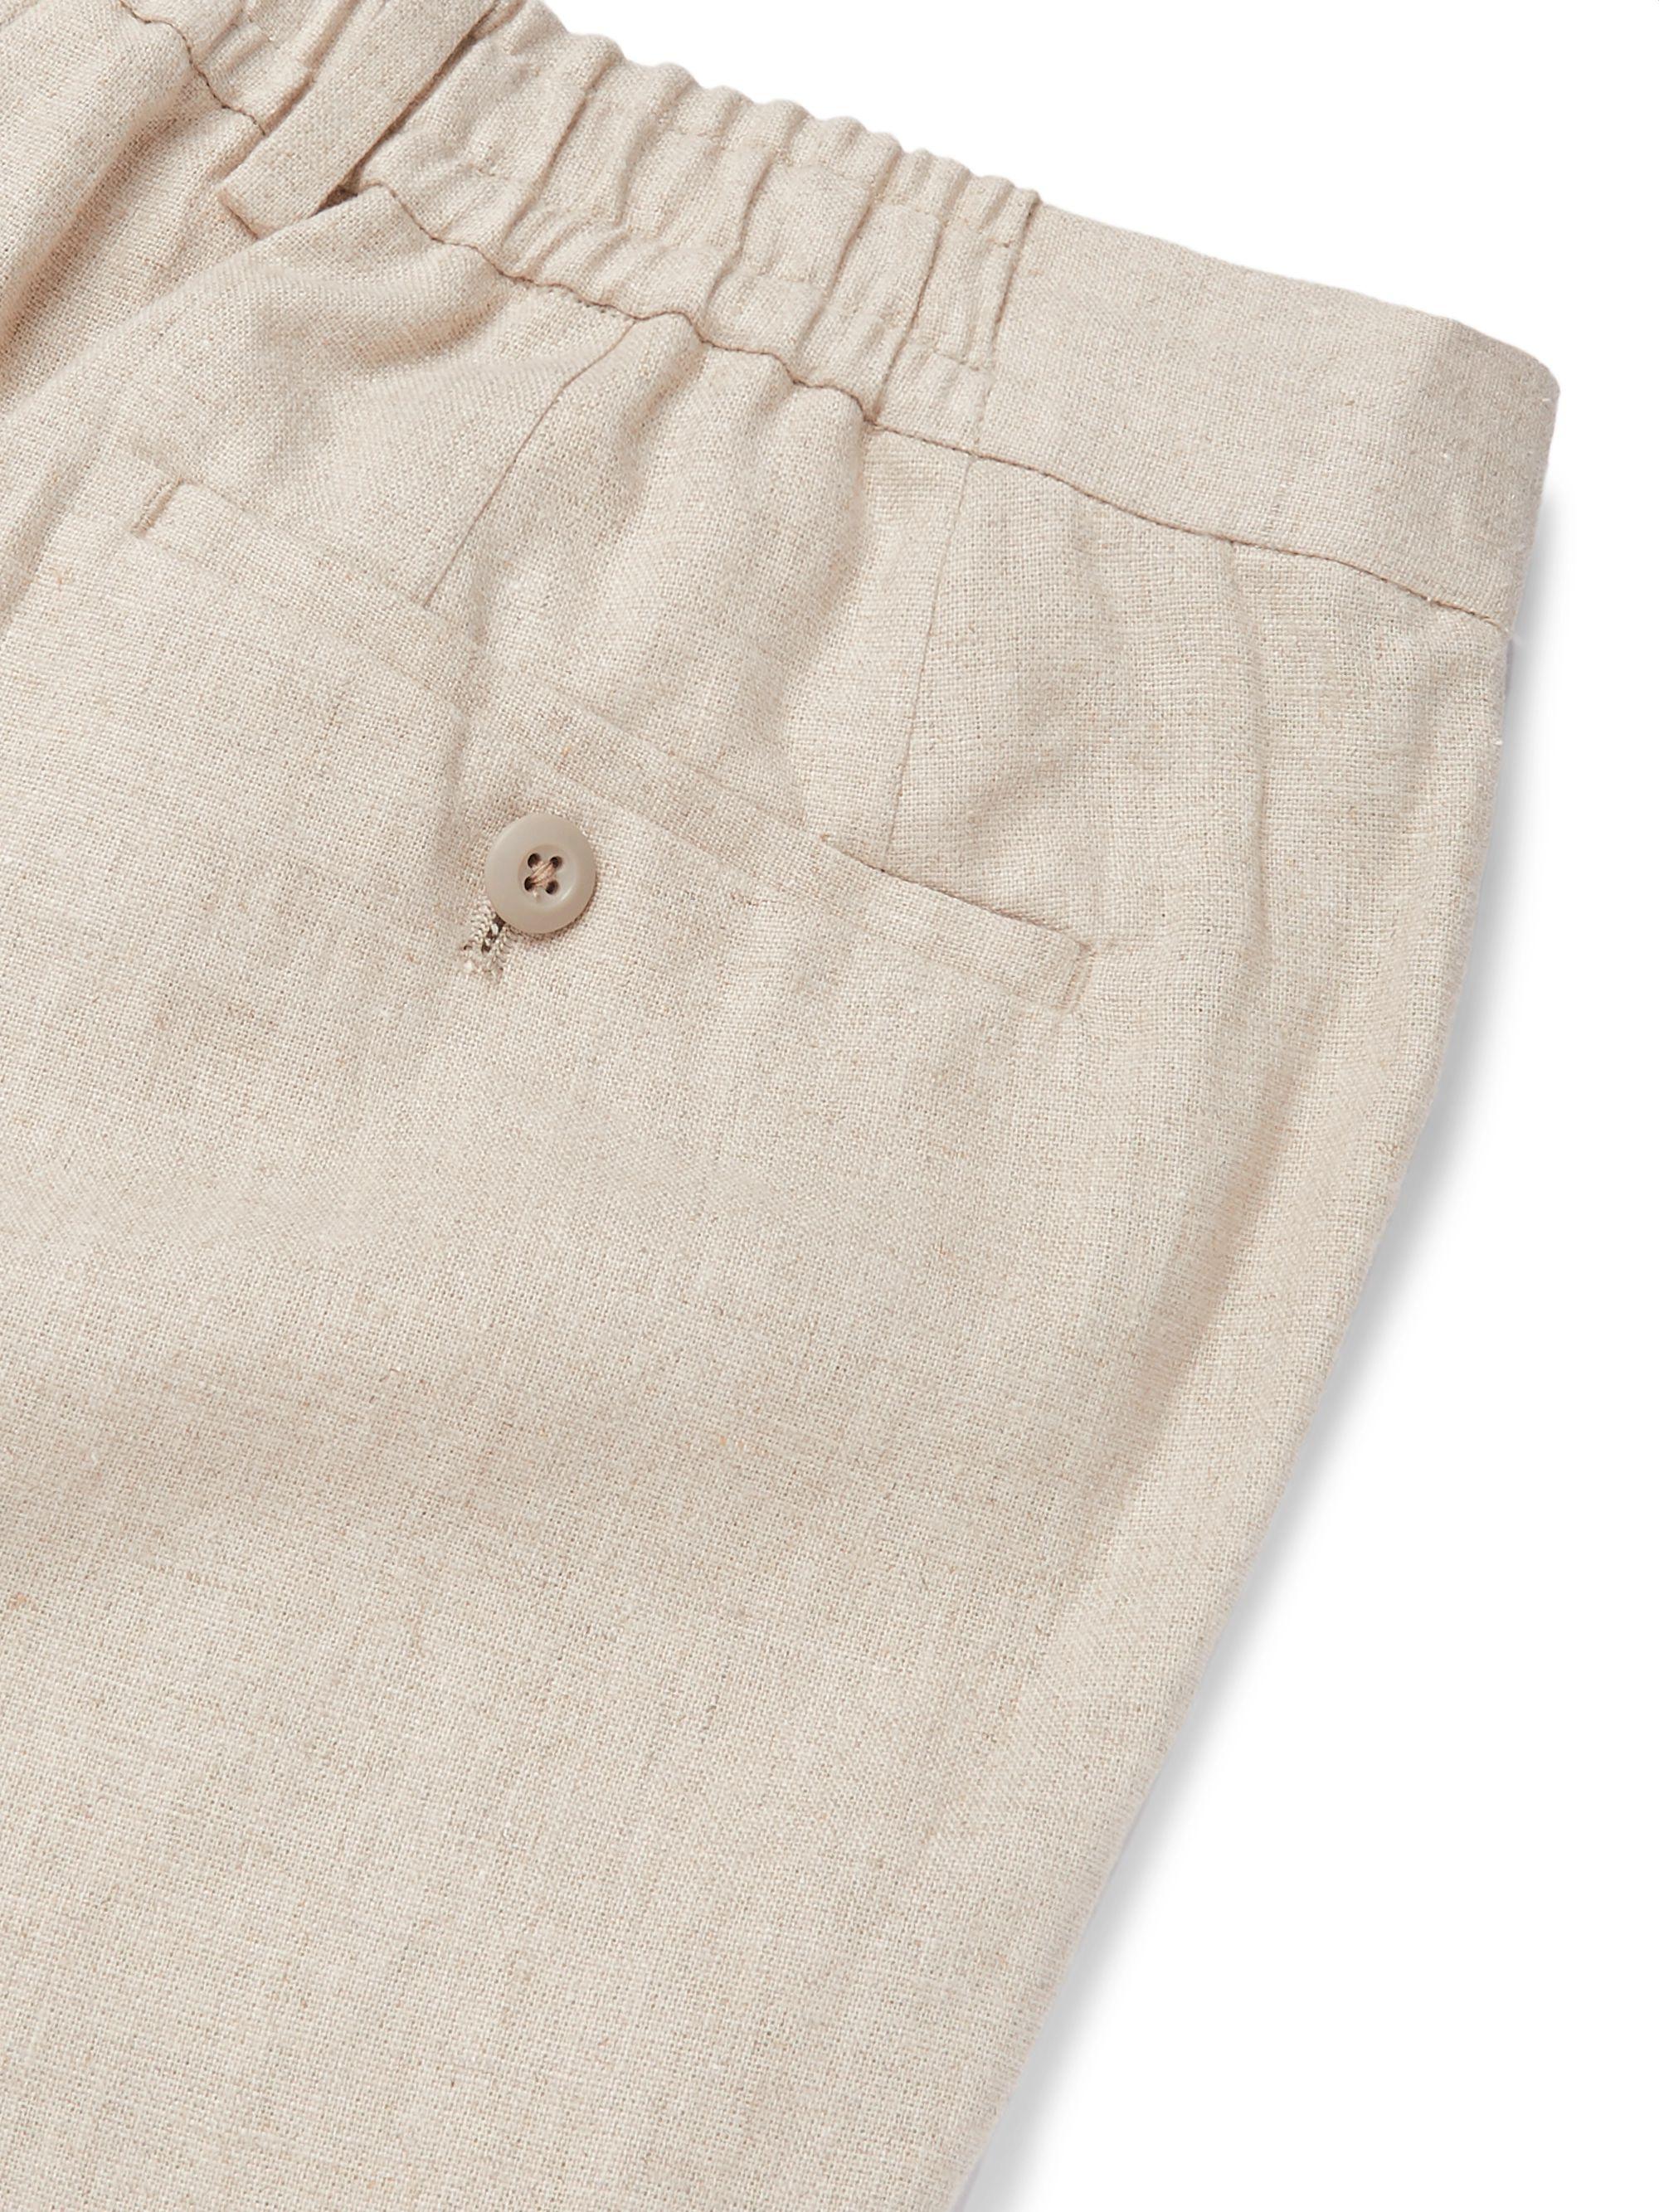 Beige Linen Drawstring Trousers | Beams F